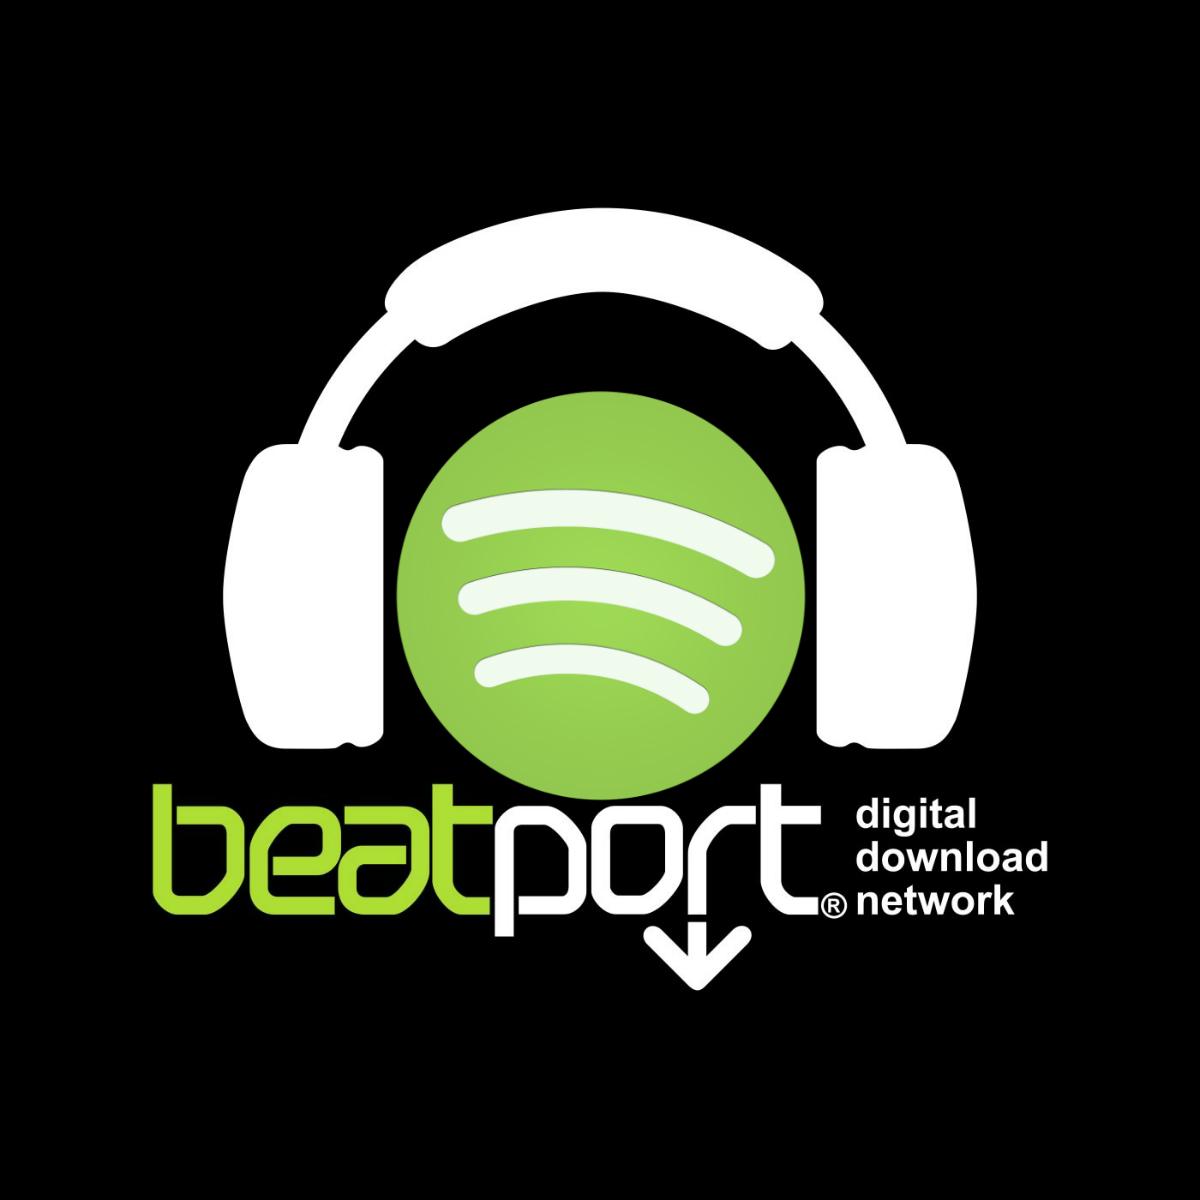 spotify e beatport